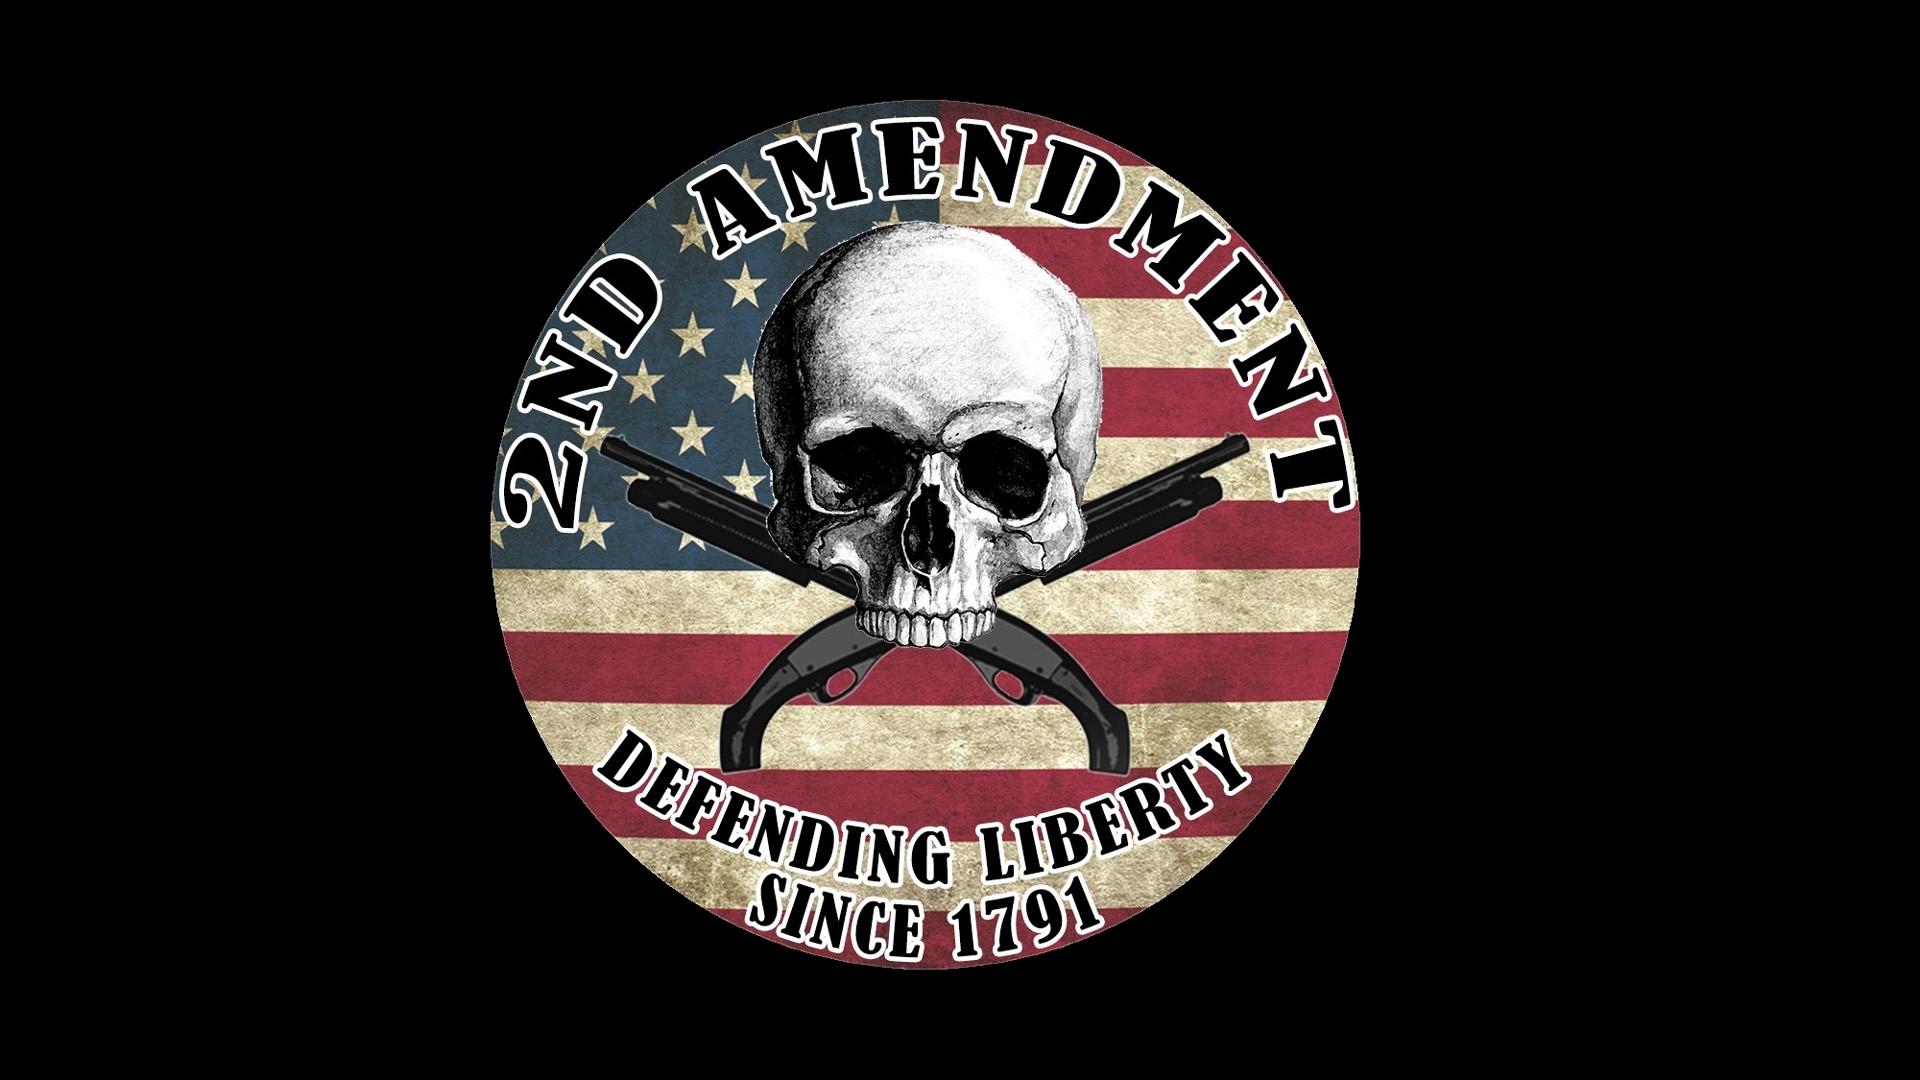 second amendment wallpaper  2Nd Amendment HD Wallpaper   Background Image   1920x1080   ID ...